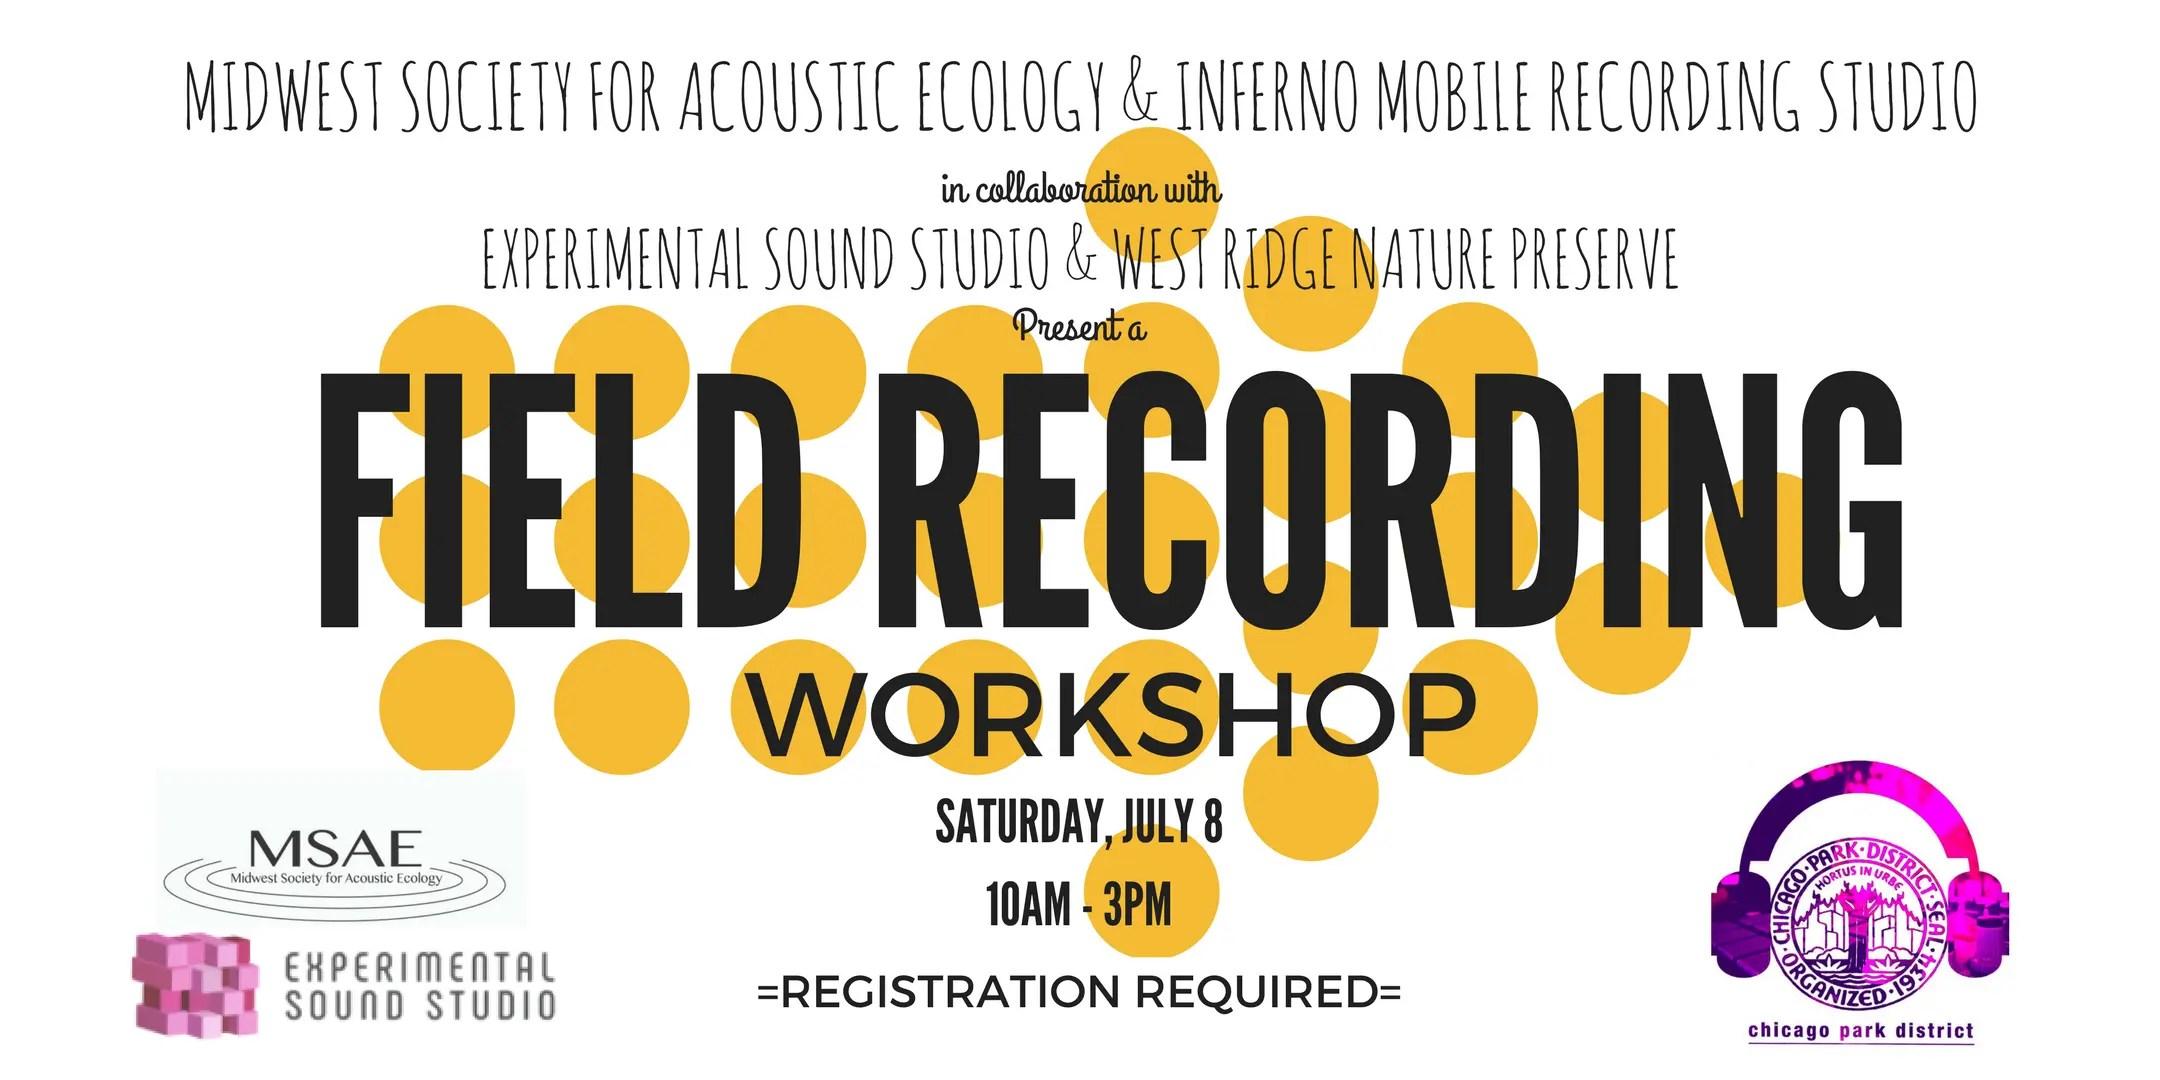 Field Recording Workshop Sat., July 8th